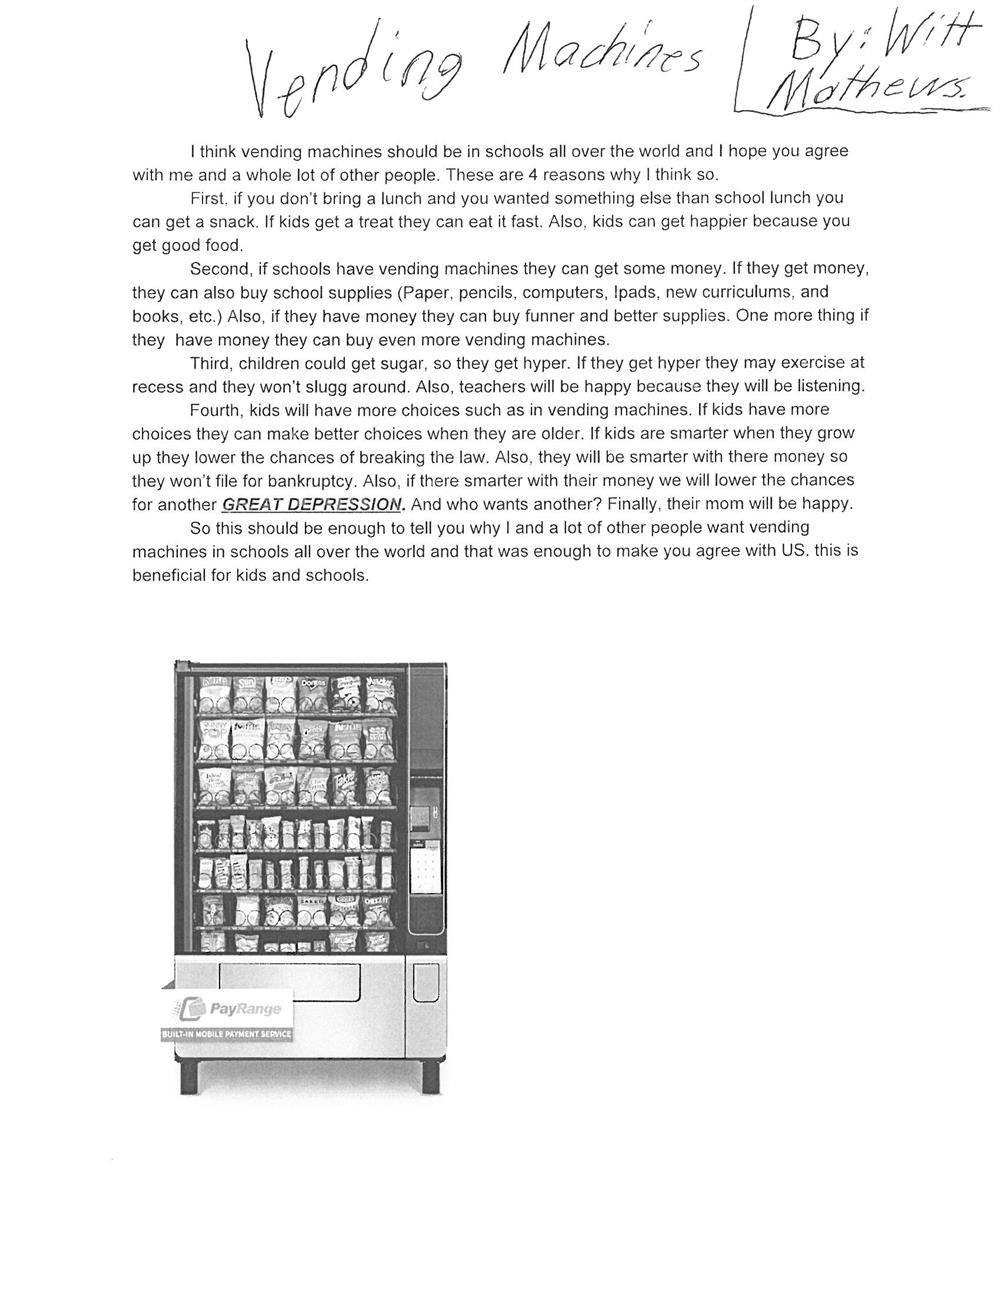 Blake, Cecilia - 4th Grade / Persuasive Paragraphs Photo Gallery